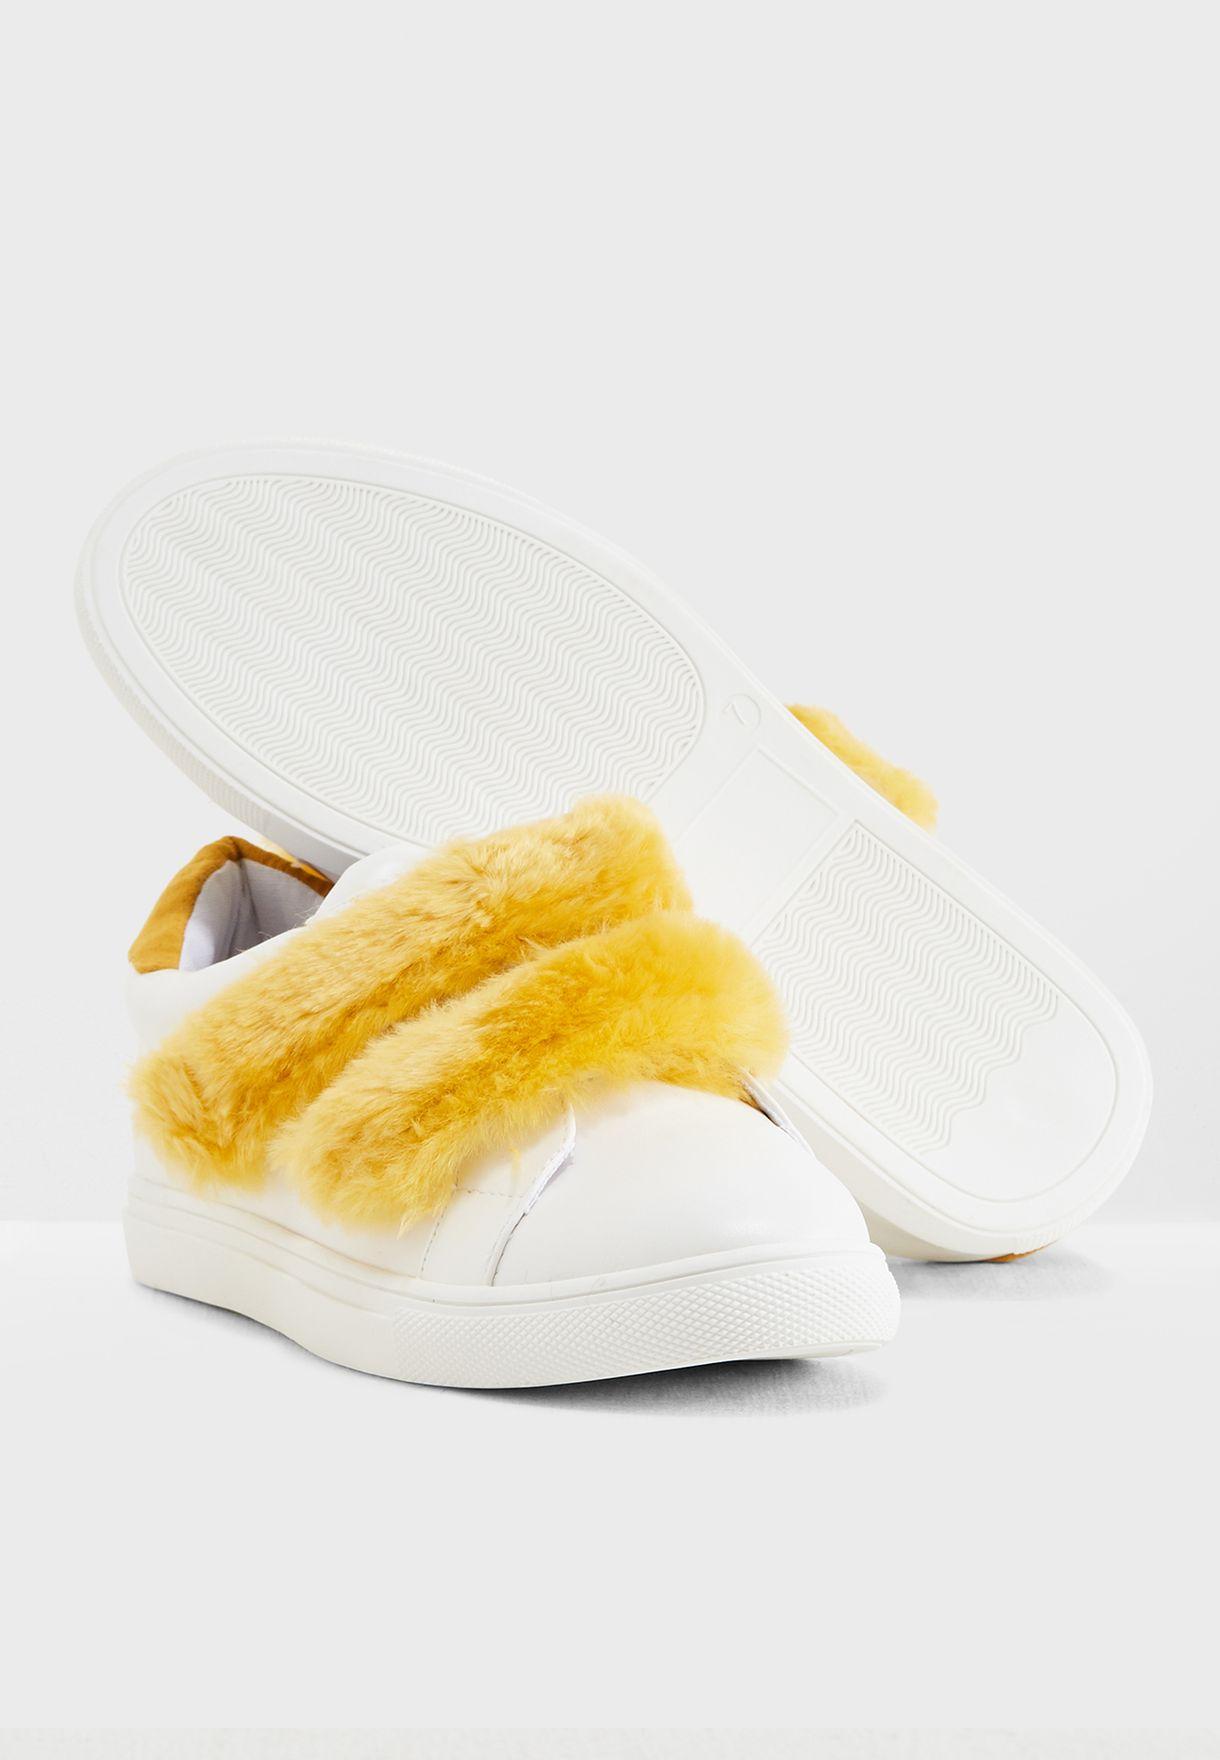 حذاء فلات مزين بفرو